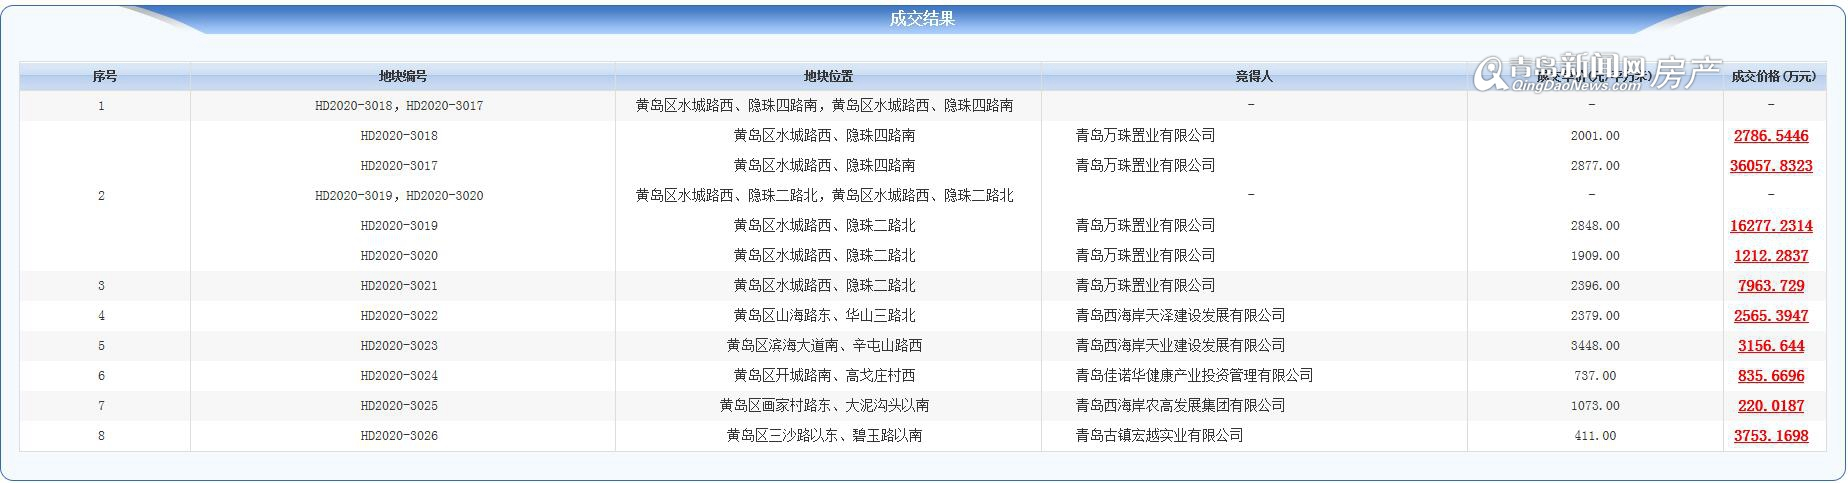 http://img.zhux2.com/editor1585112922727319.jpg